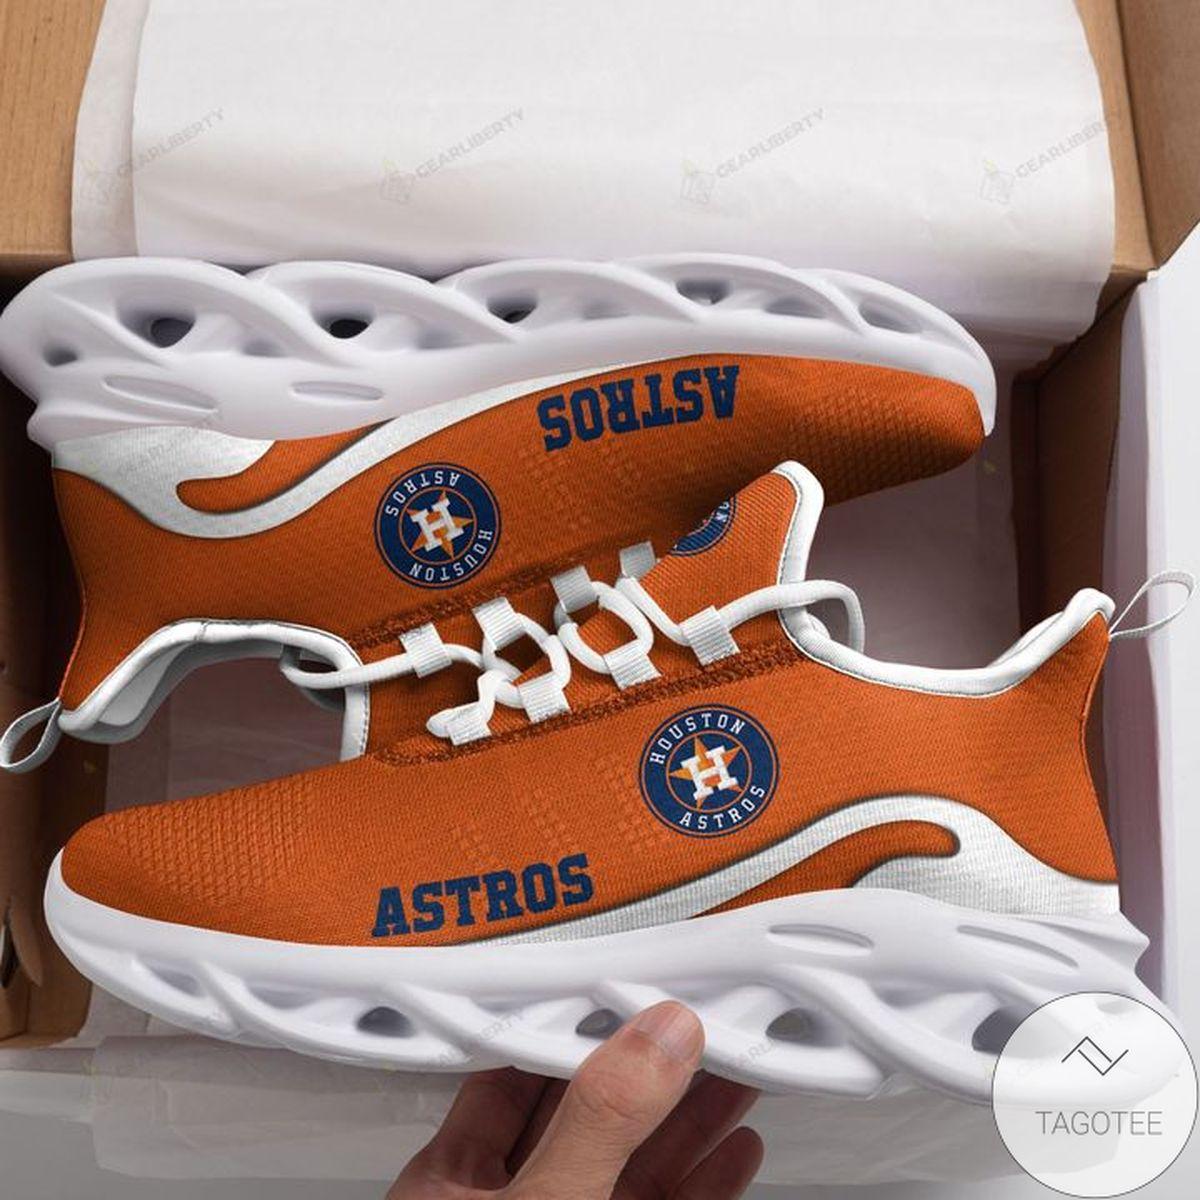 Print On Demand MLB Houston Astros Max Soul Shoes